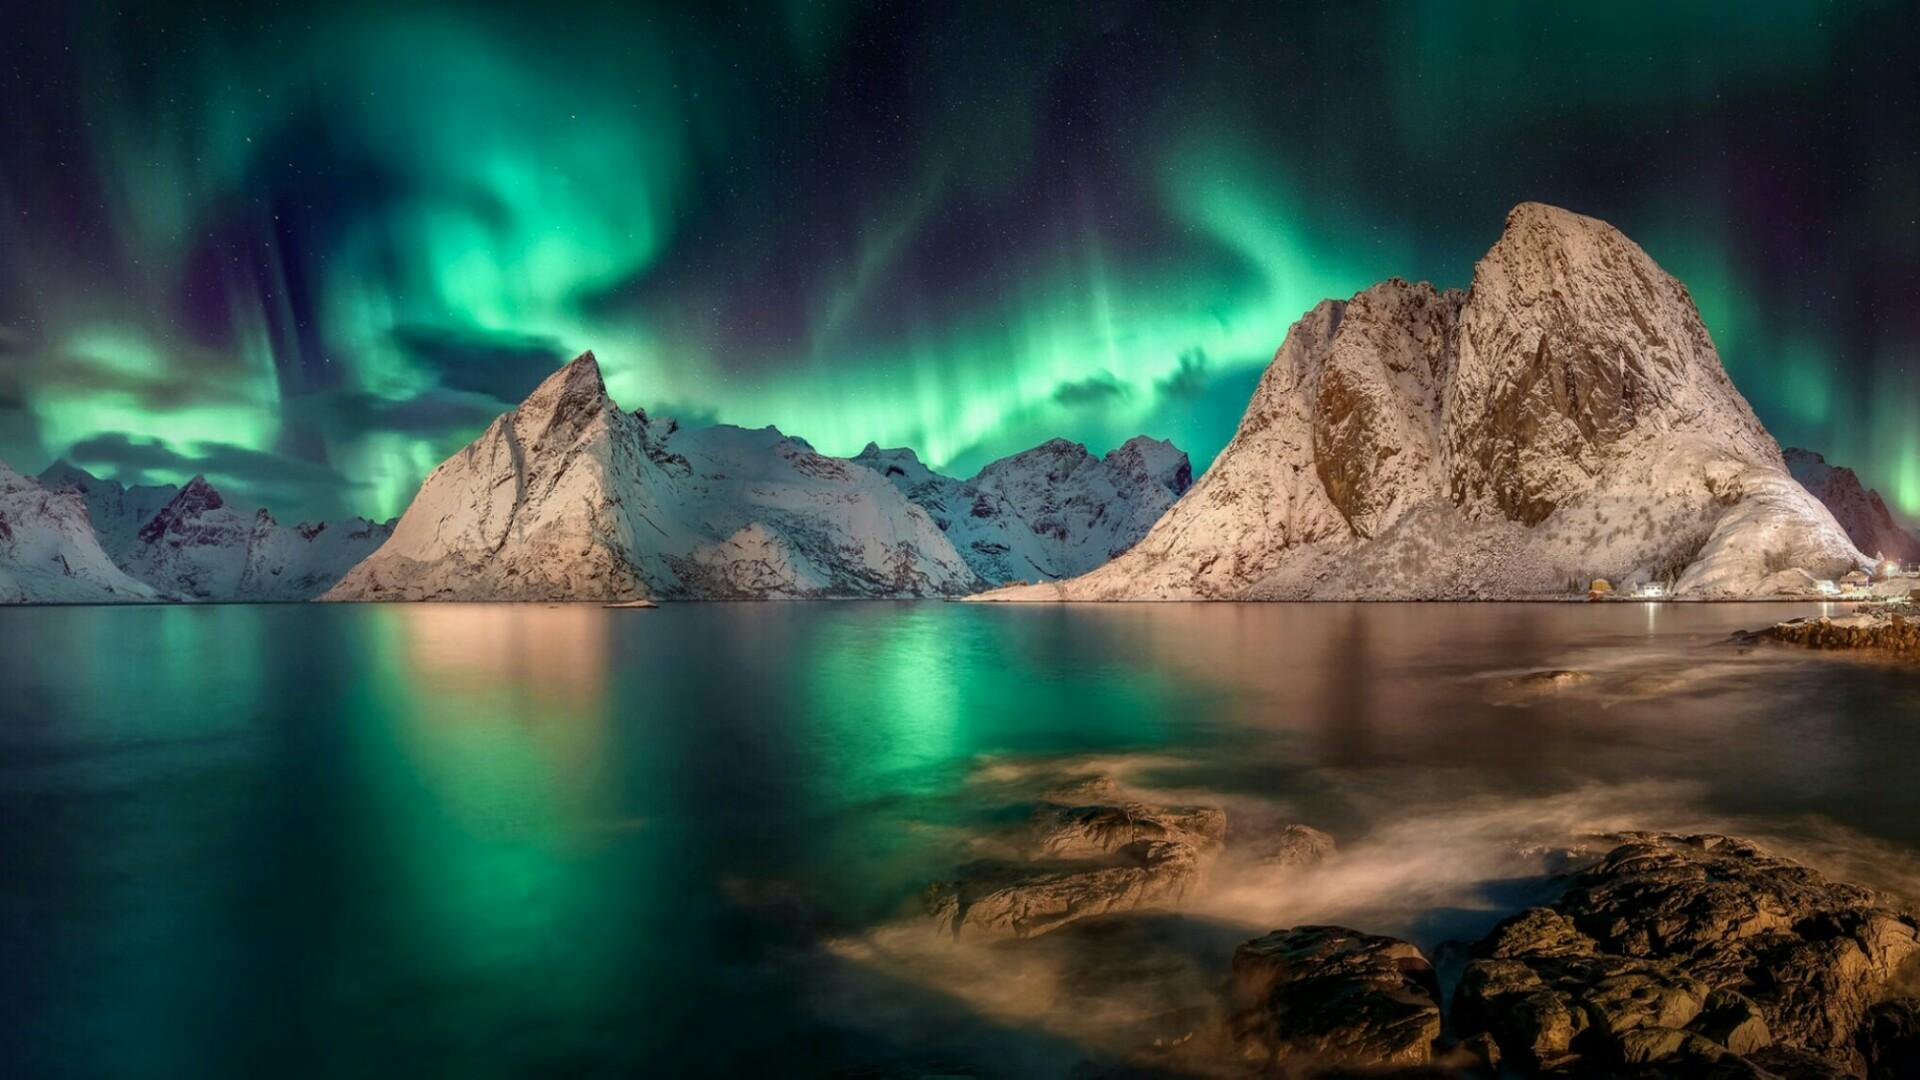 Swirling Aurora Borealis in the sky wallpaper